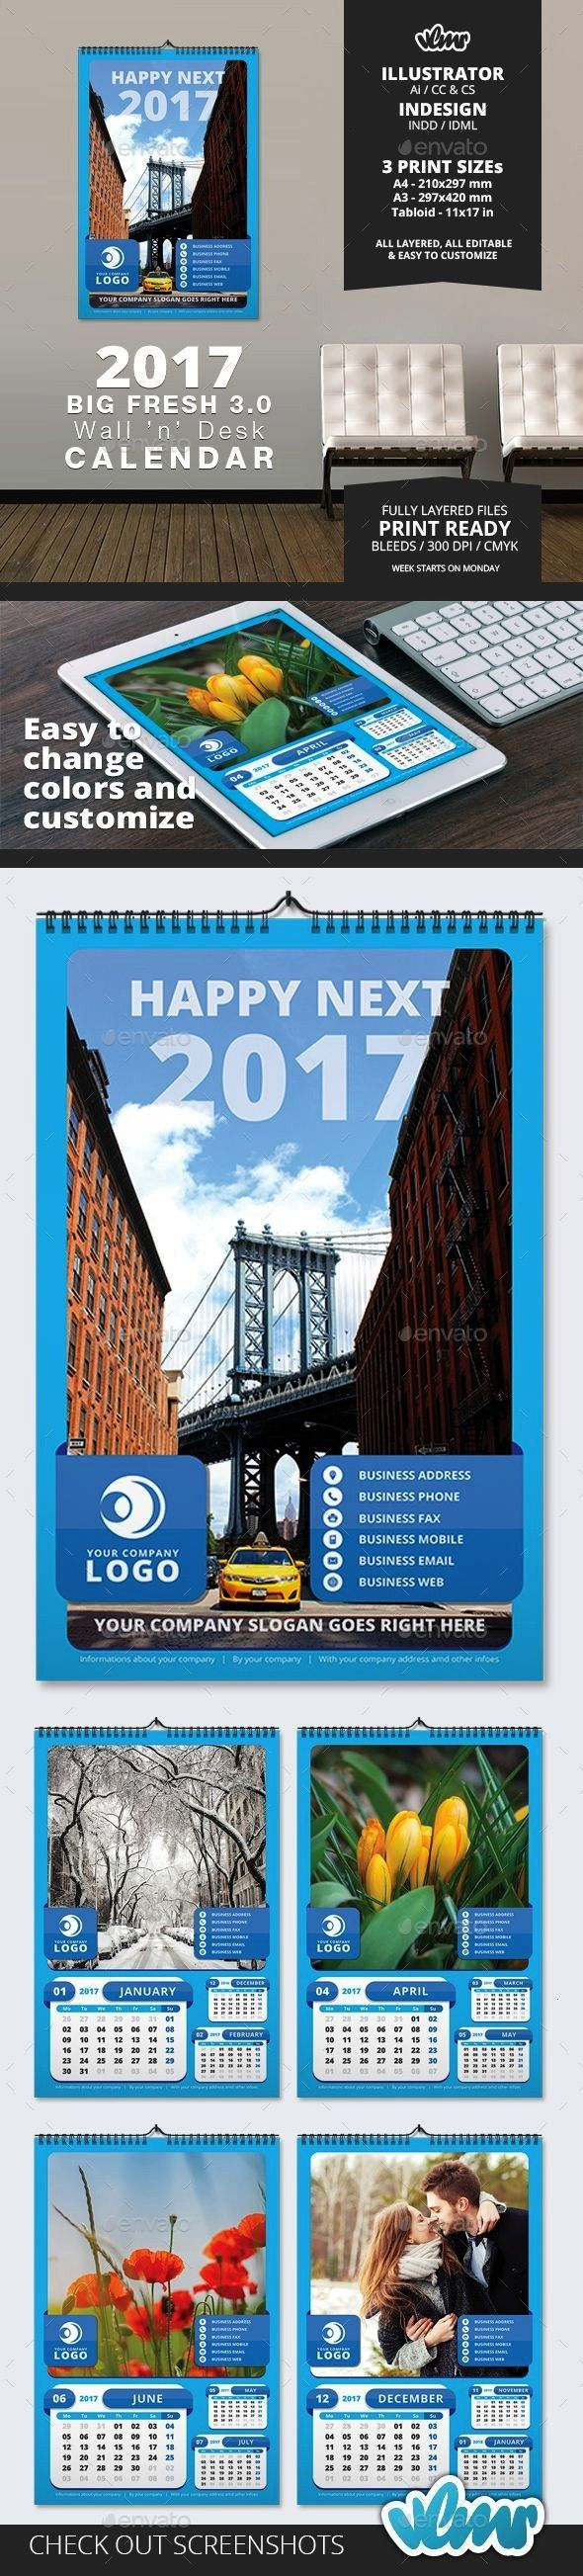 Big Fresh 03 Wall n Desk Calendar Template  InDesign Template 2017 Big Fresh 03 Wall n Desk Calendar Template  InDesign Template 2017 Big Fresh 03 Wall n Desk Calendar Te...